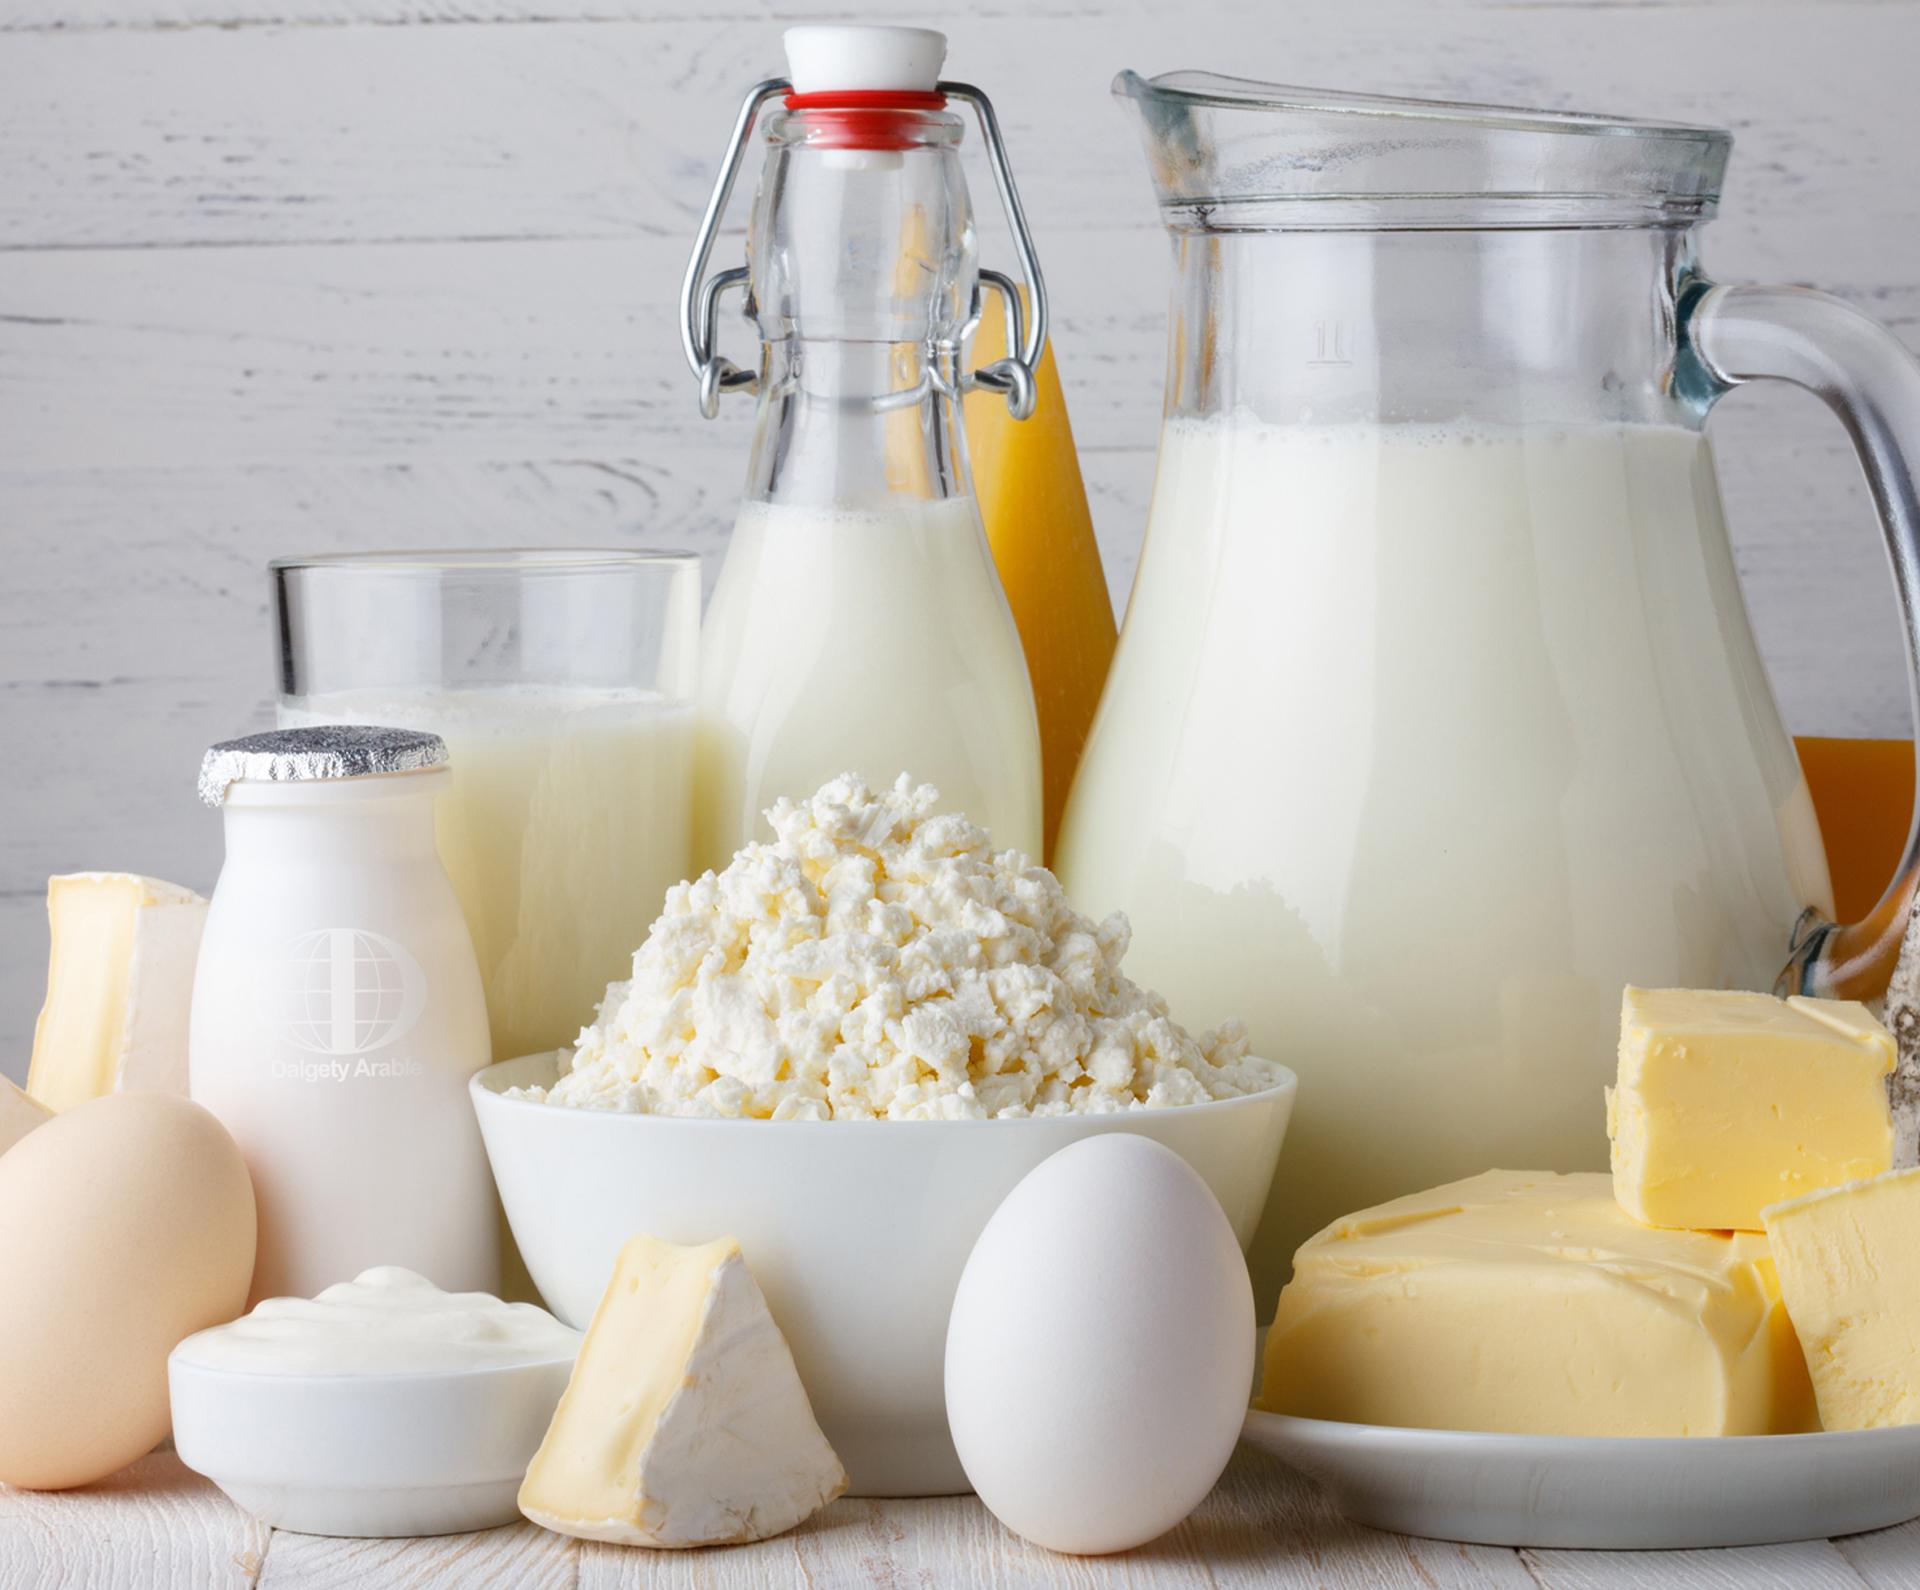 milkbuttereggs